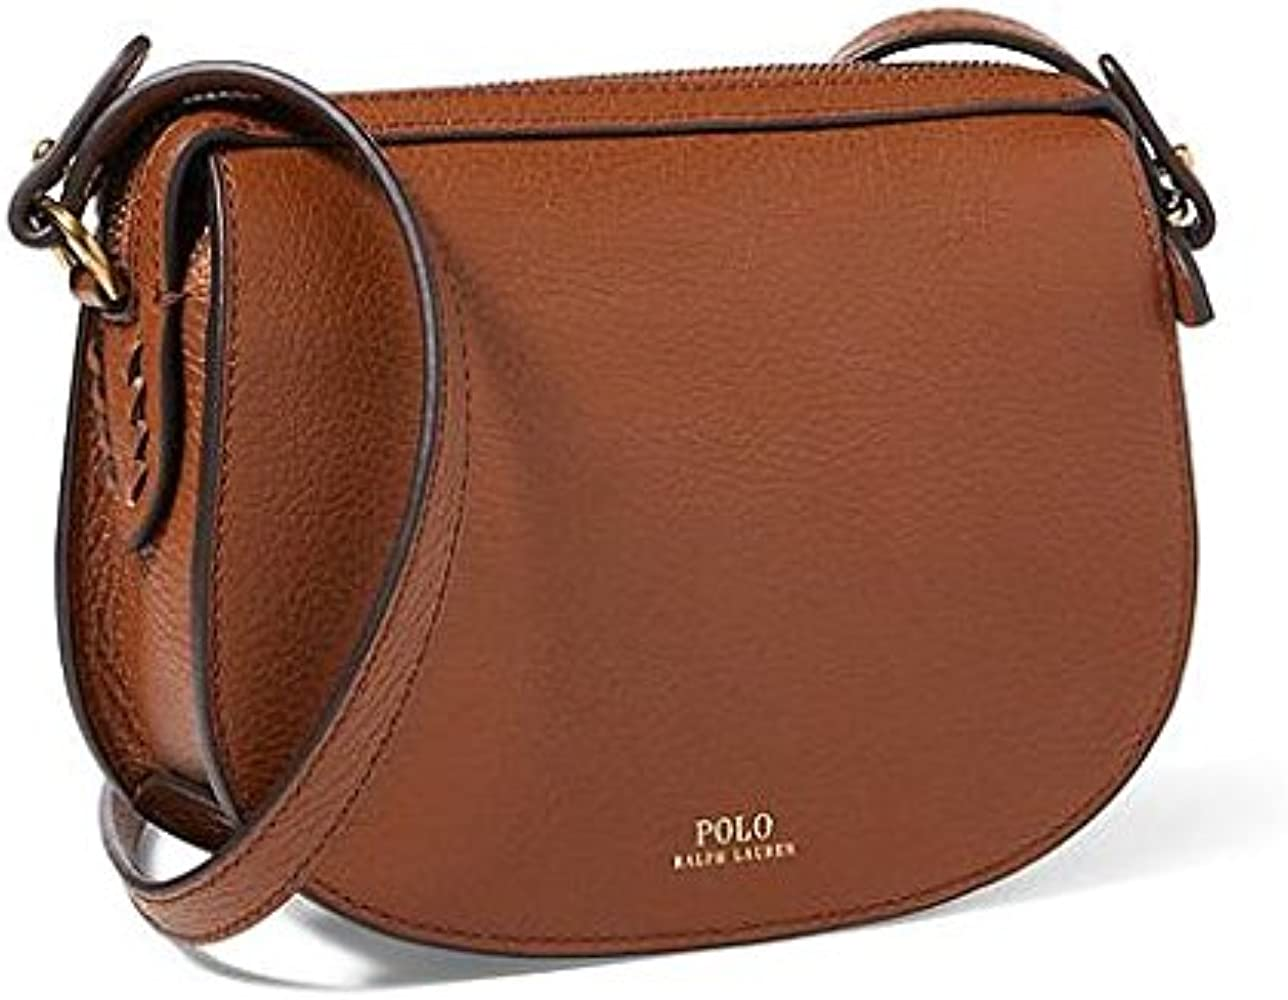 Ralph Lauren Bolso Polo Mini Bag CXB-MIN (Negro): Amazon.es ...